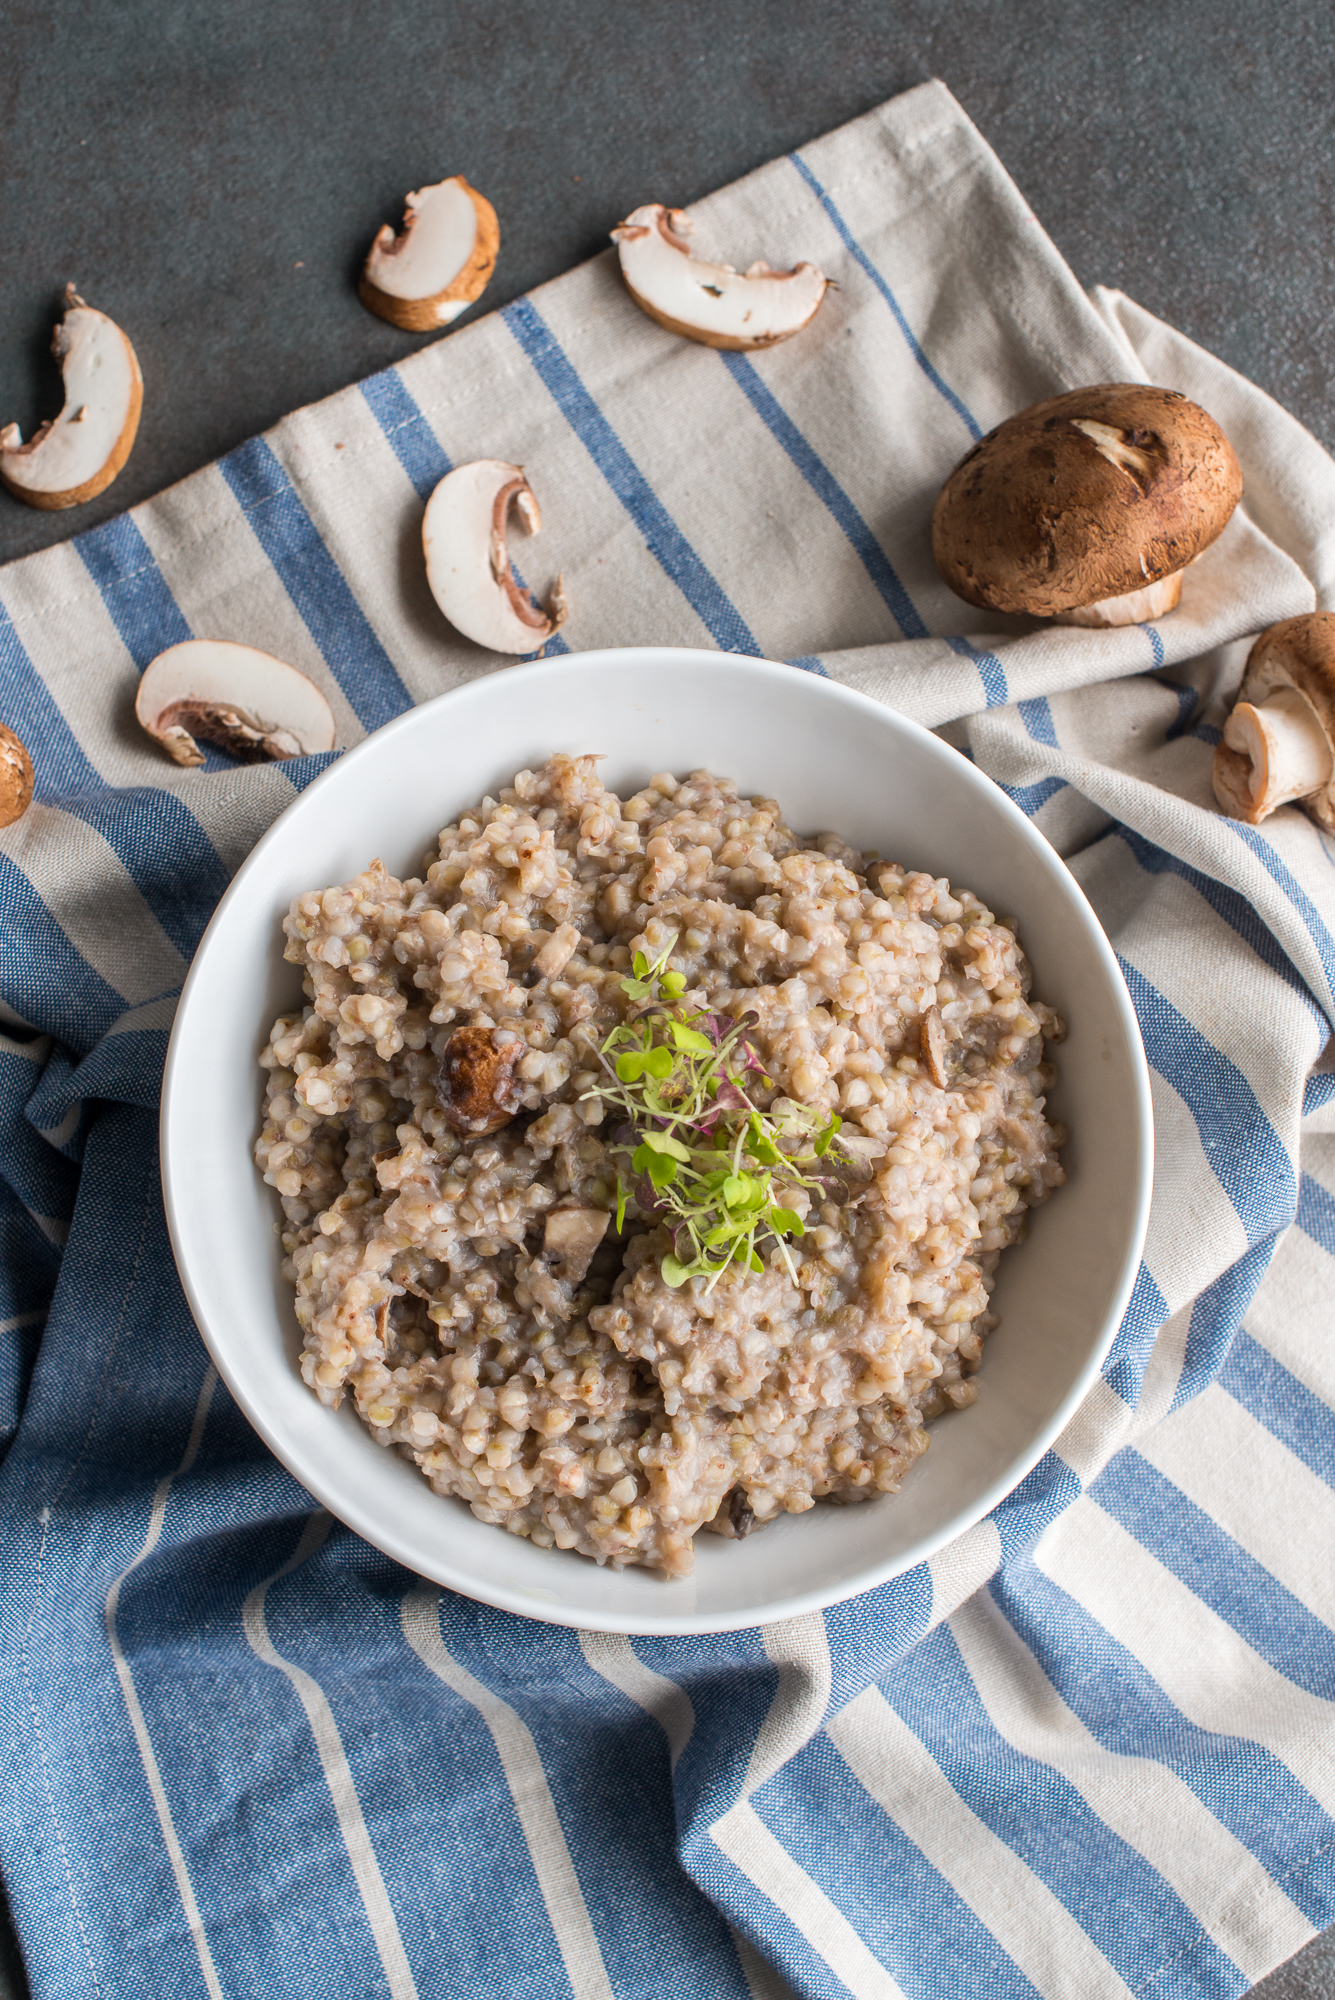 Buckwheat Mushroom Risotto (Gluten Free, Dairy Free)